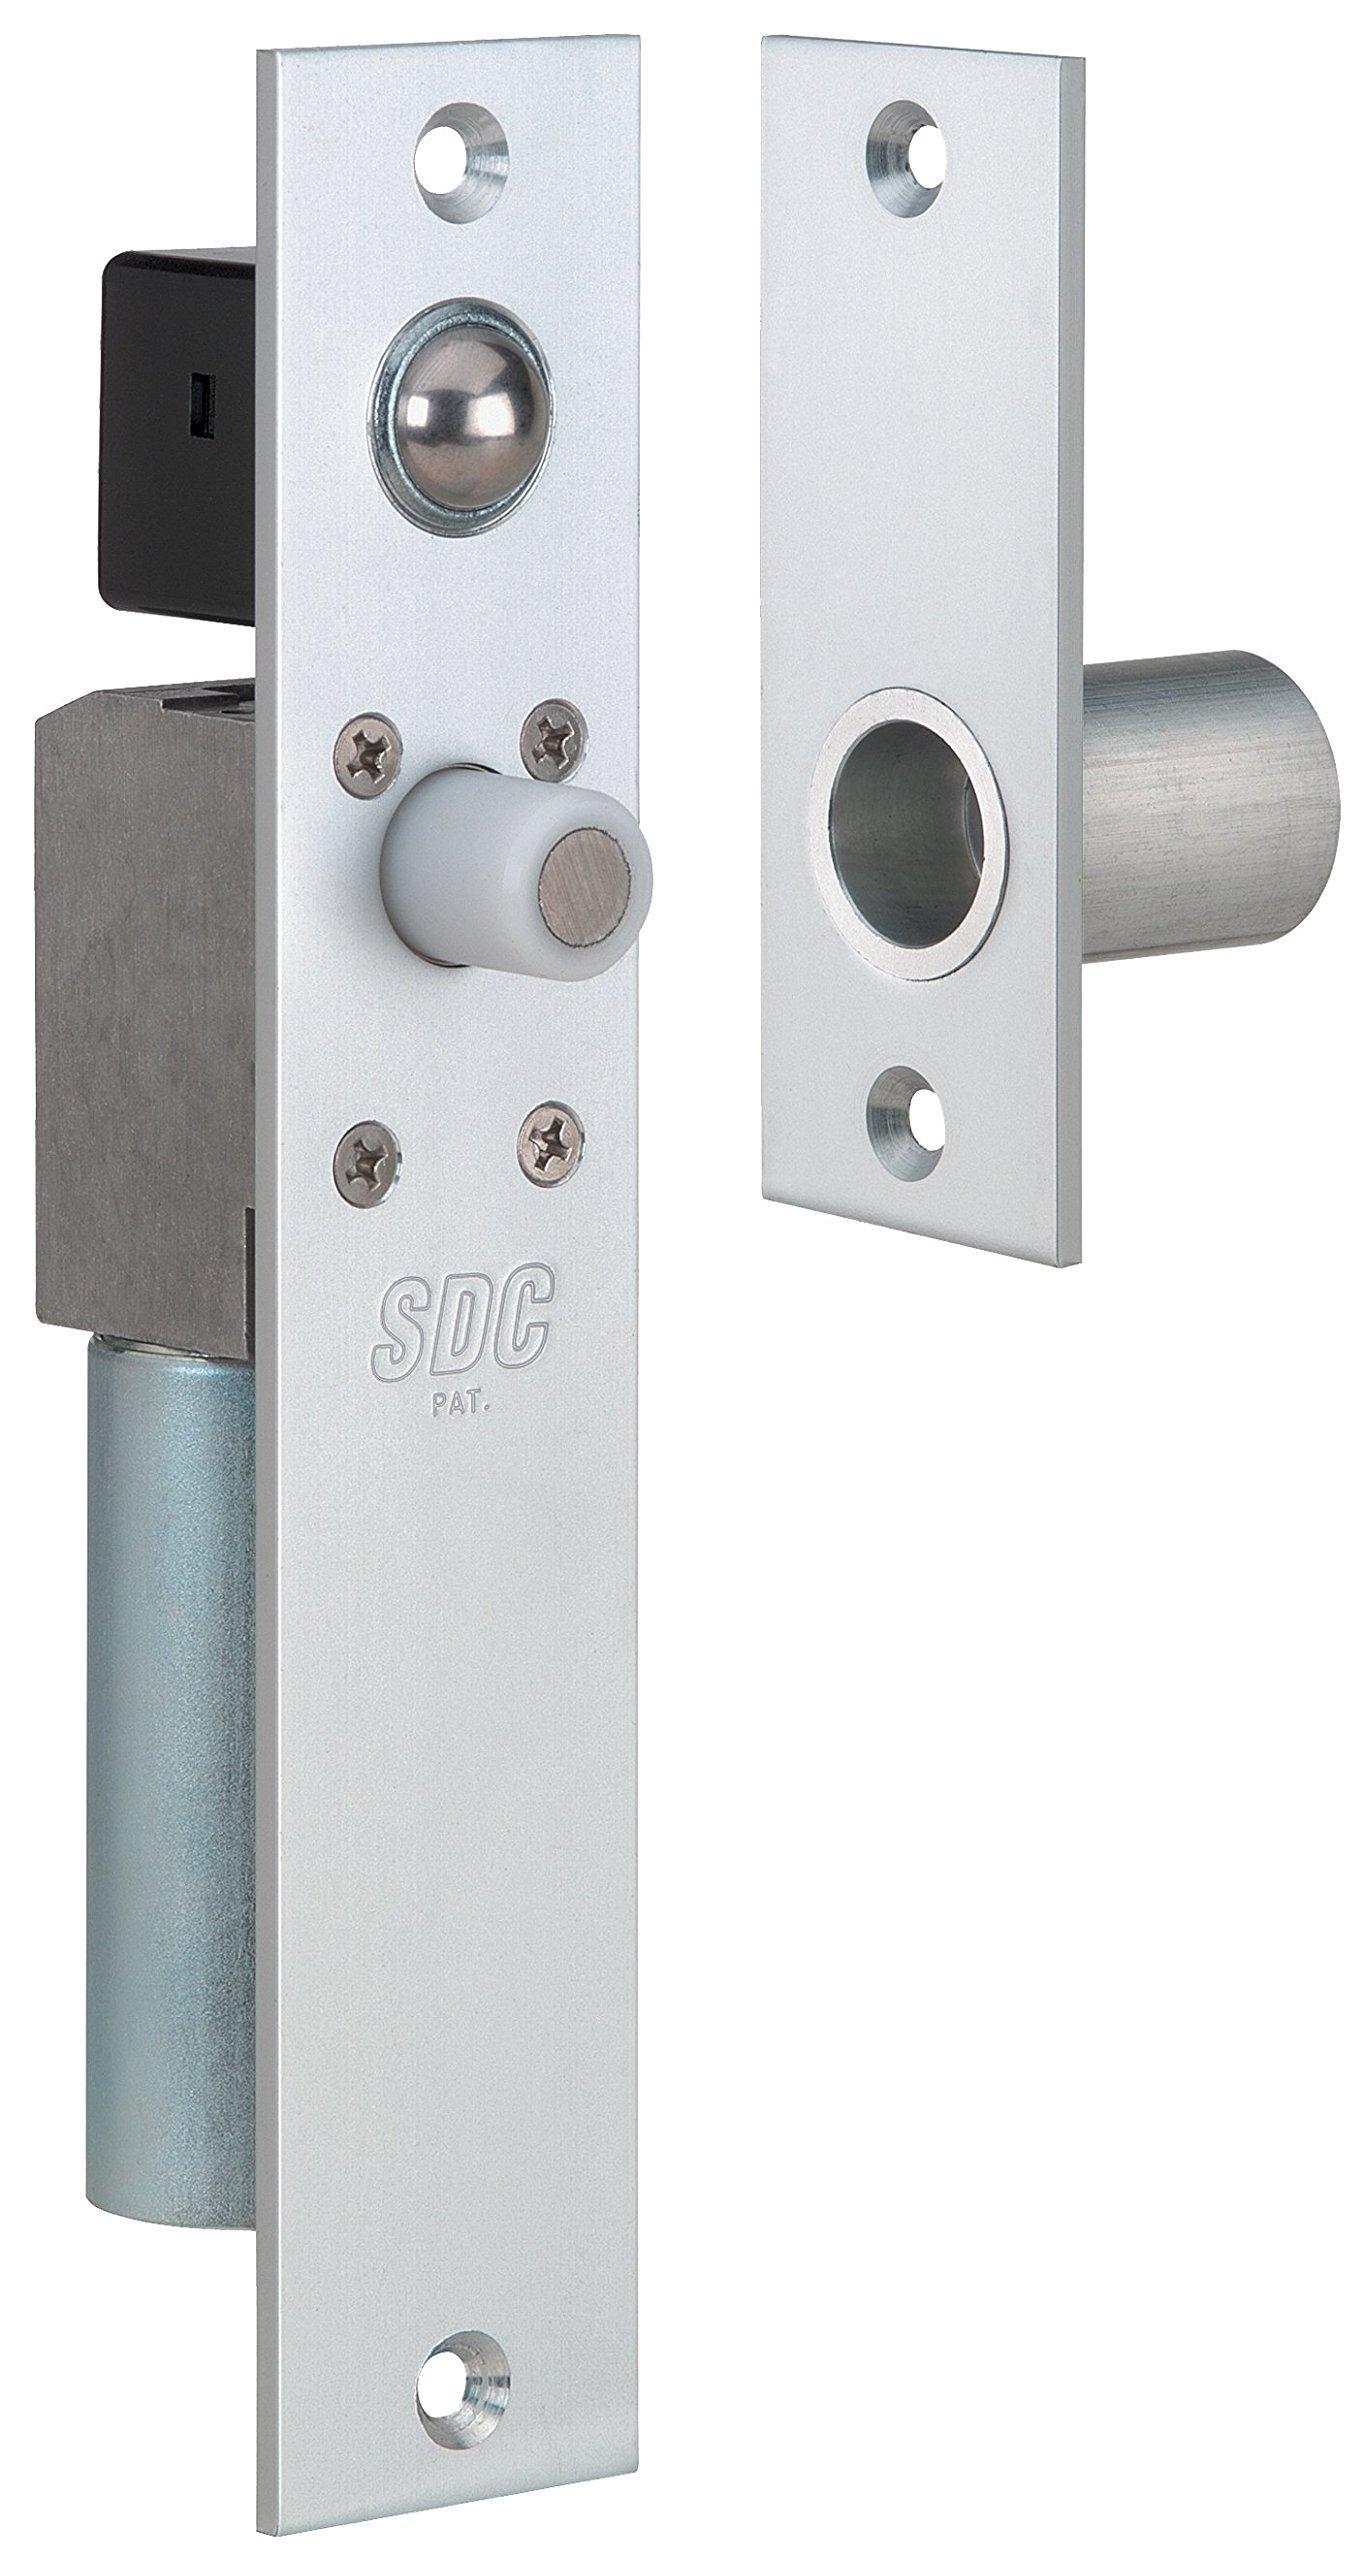 SDC FS23MIQ Spacesave Bortise Bolt Lock, Fits 1-3/4'', Dual Failsafe, 12/24 VDC, Dull Chrome